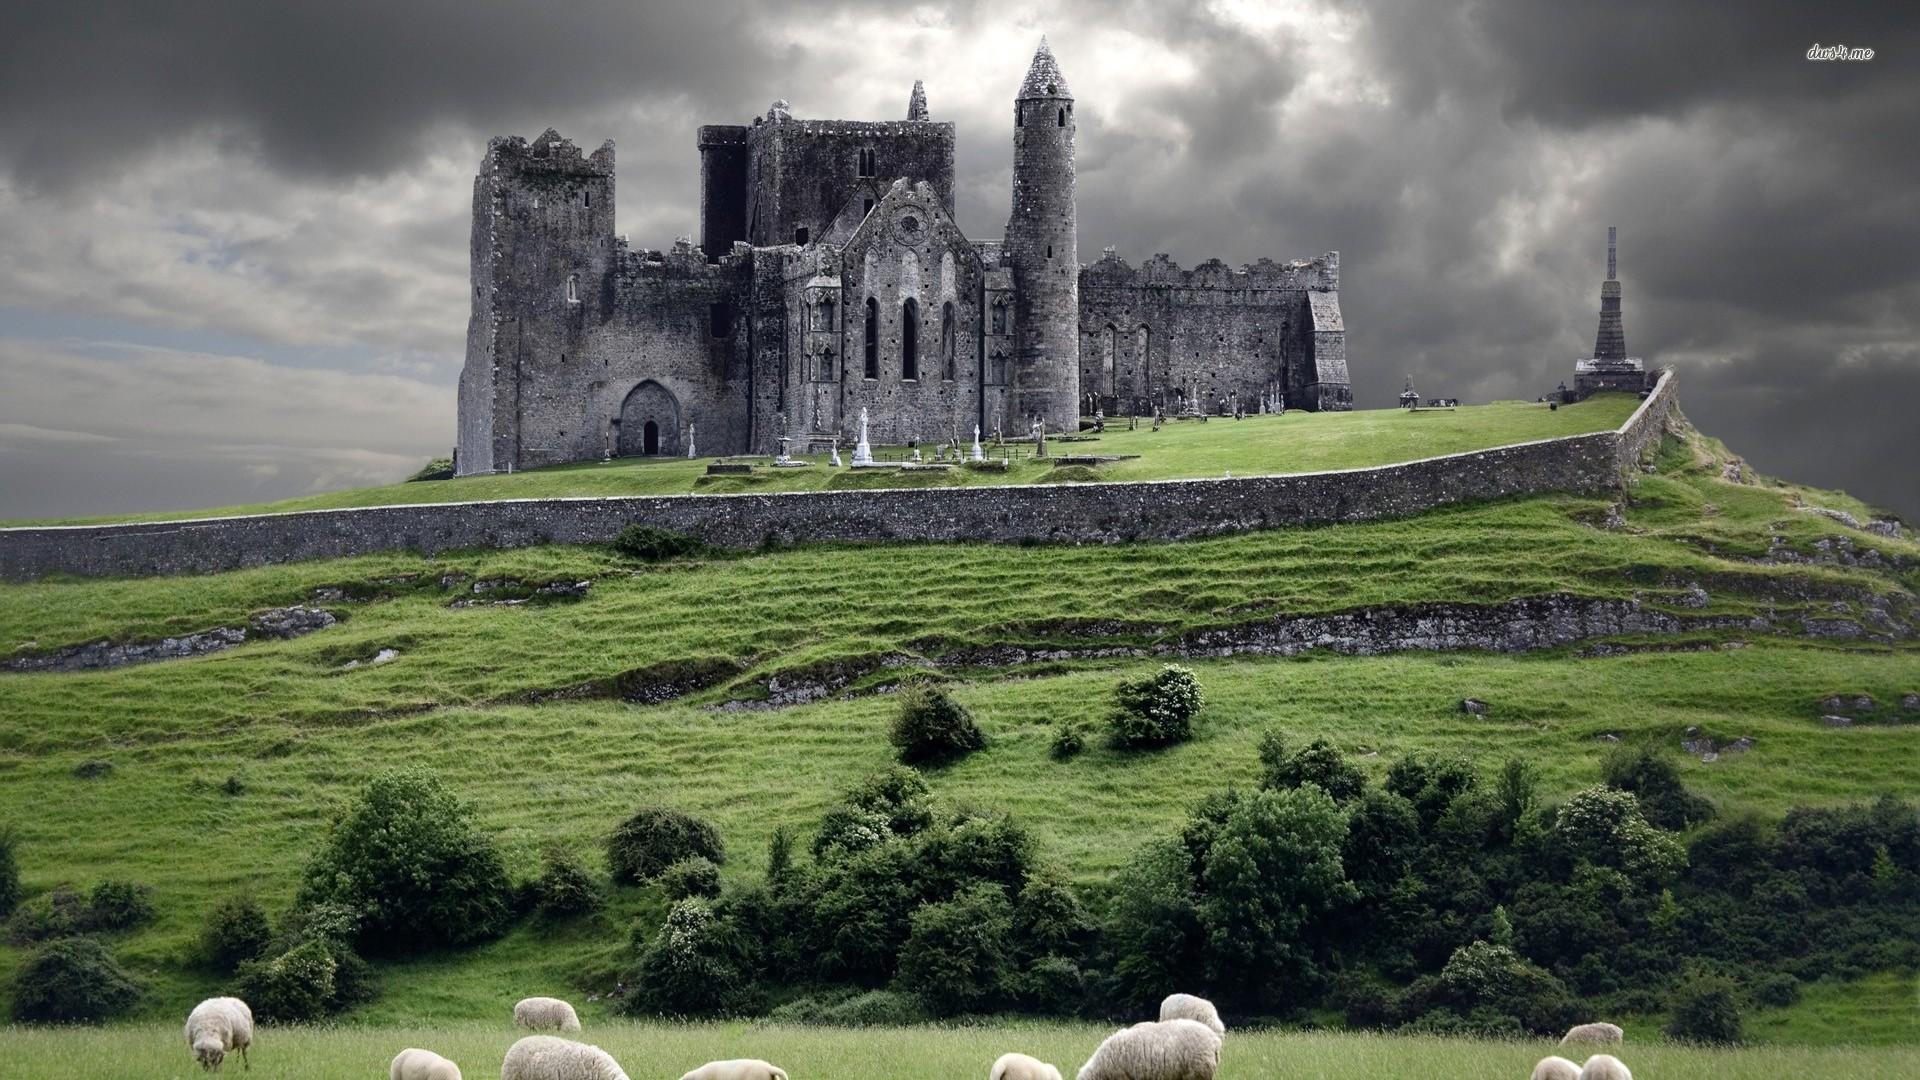 Ireland Castles Wallpaper - WallpaperSafari Ireland Castle Wallpaper